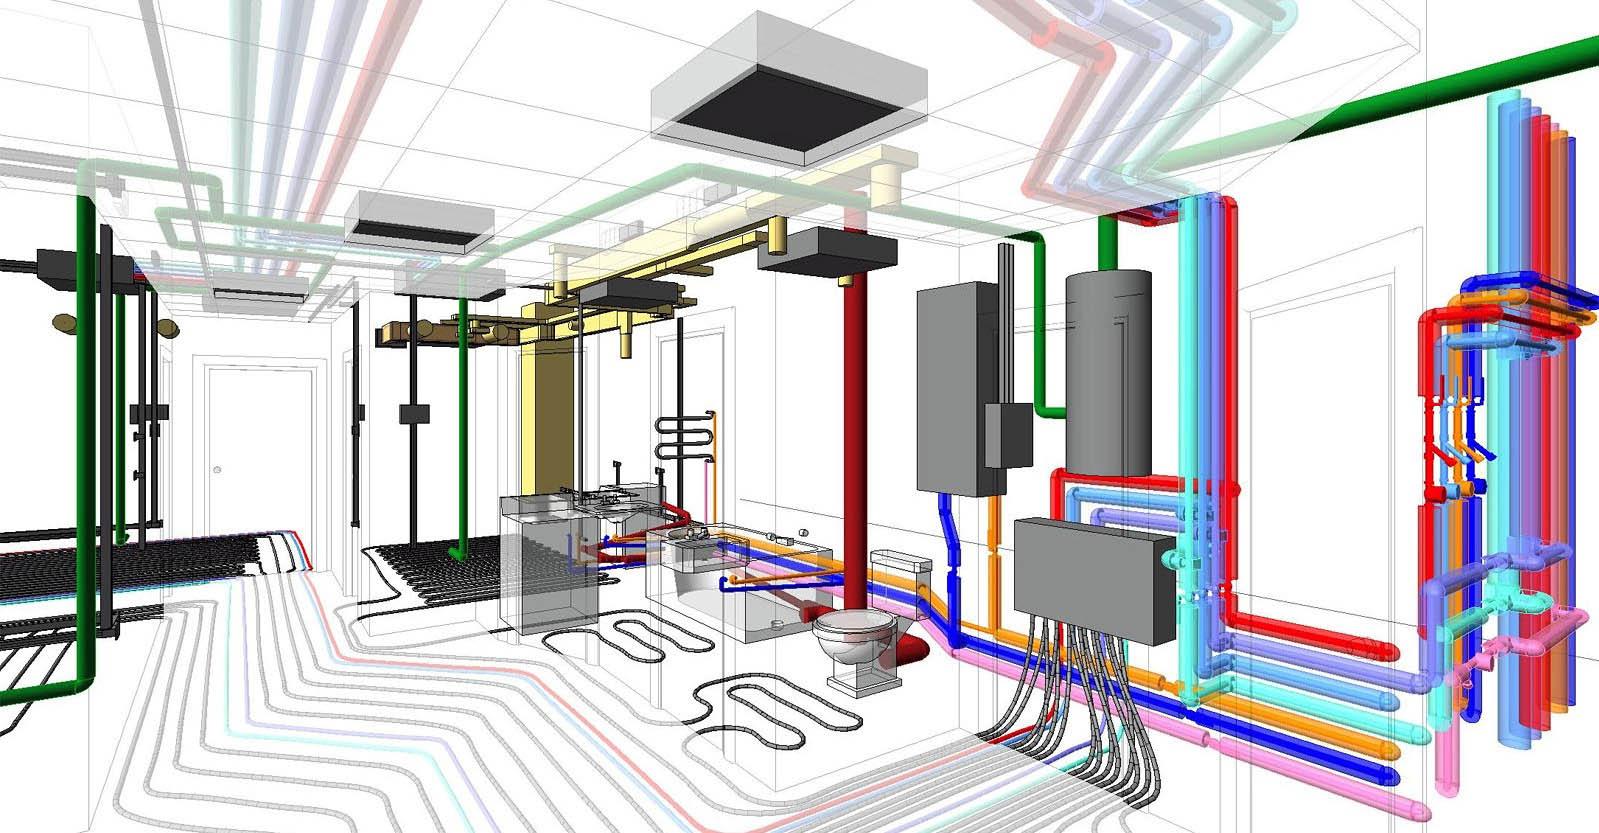 Коммуникации Вентиляция водоснабжение отопление электрика